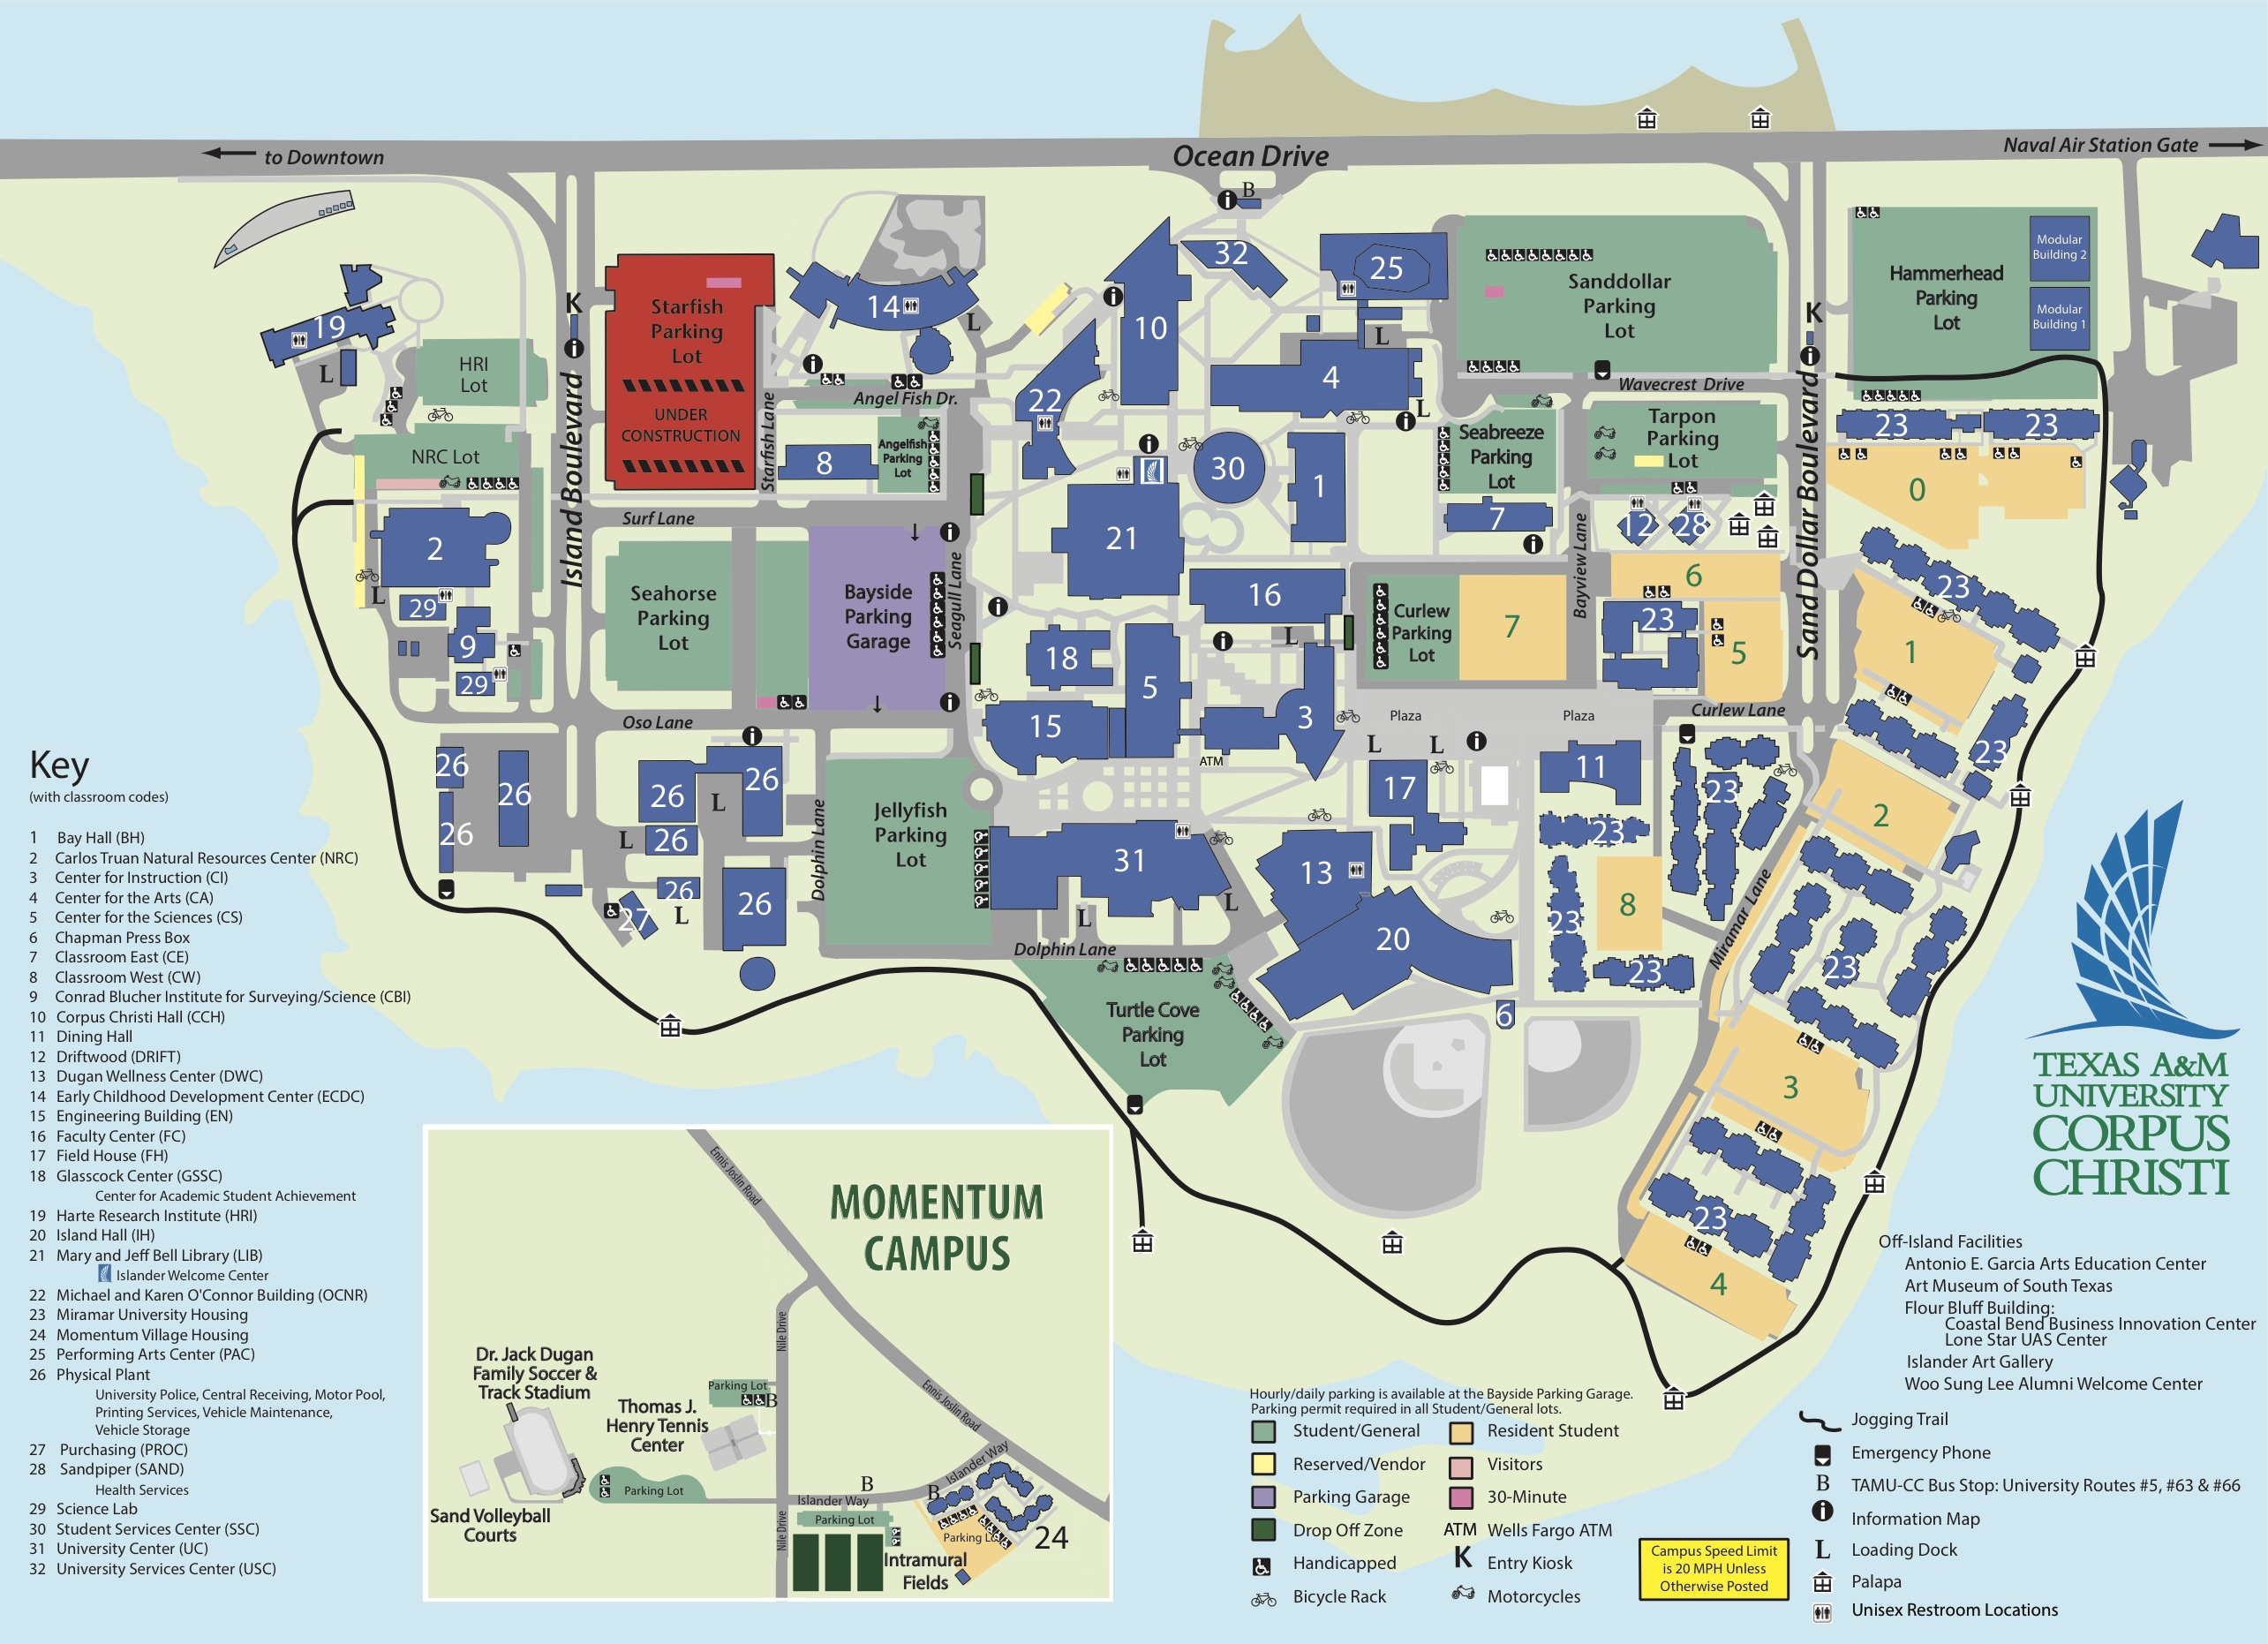 Campus Map Texas A&m University-Corpus Christi - Texas A&m Map